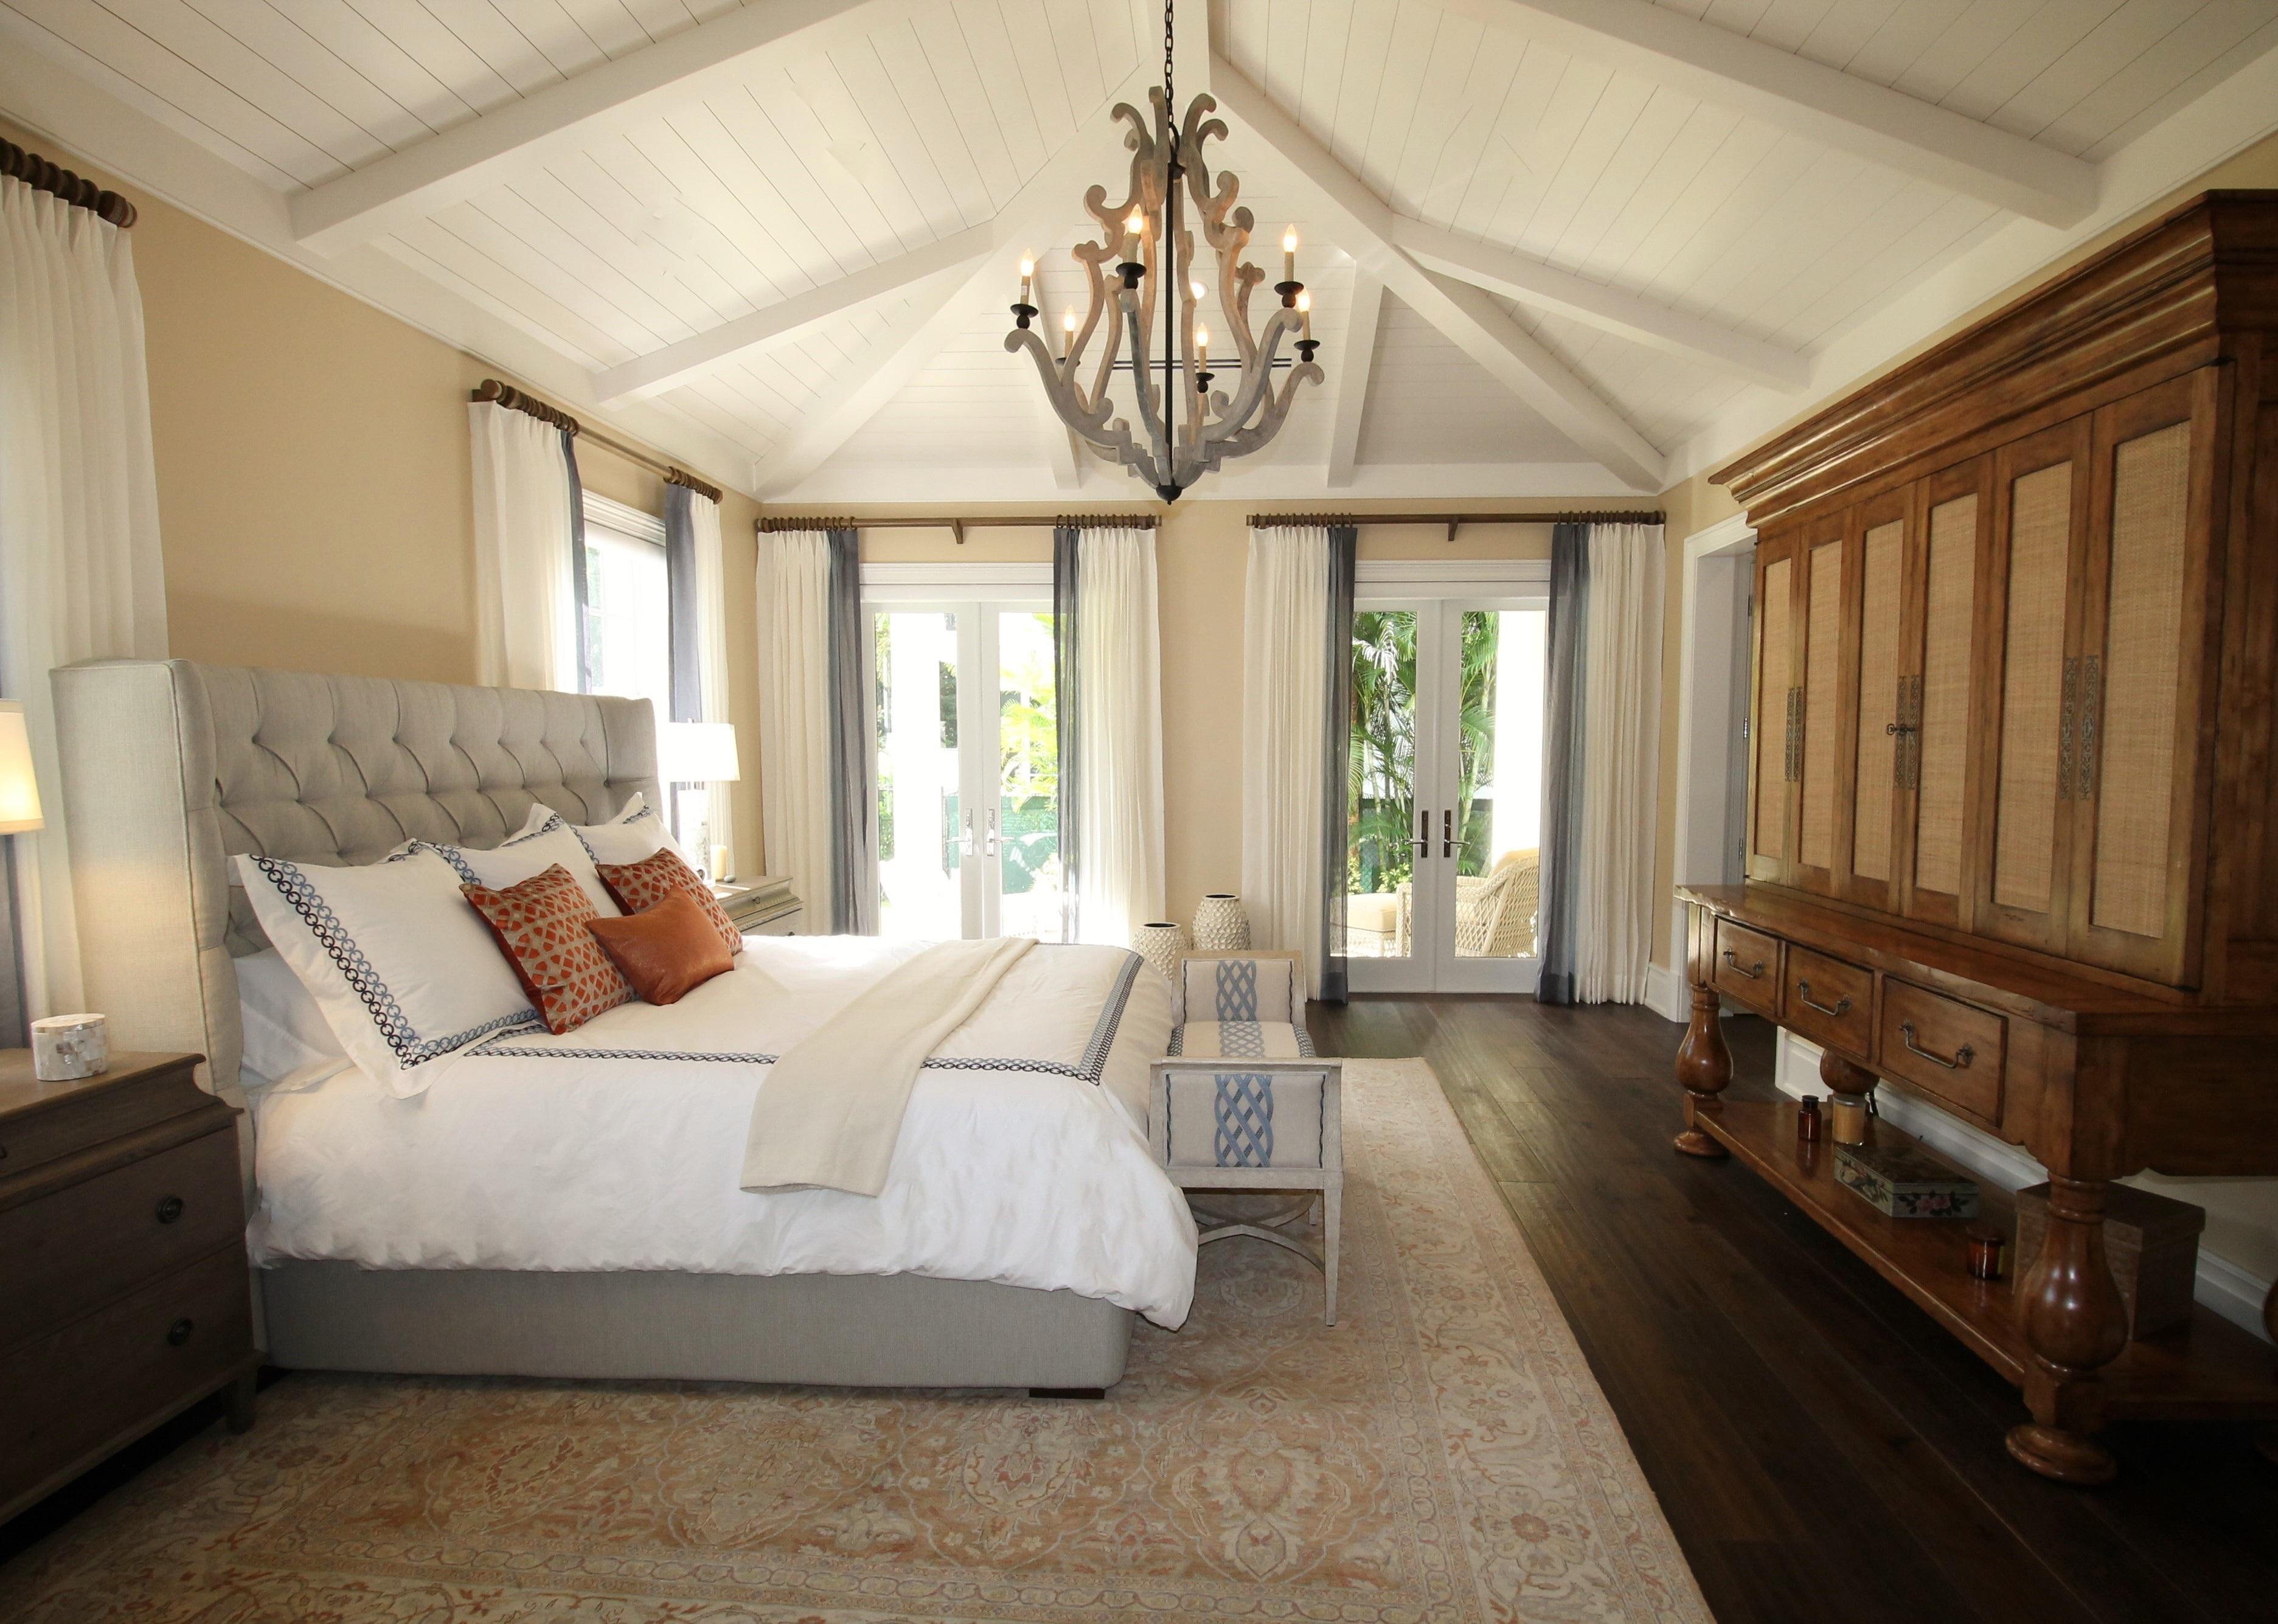 Free Images : Villa, Mansion, Floor, Home, Ceiling